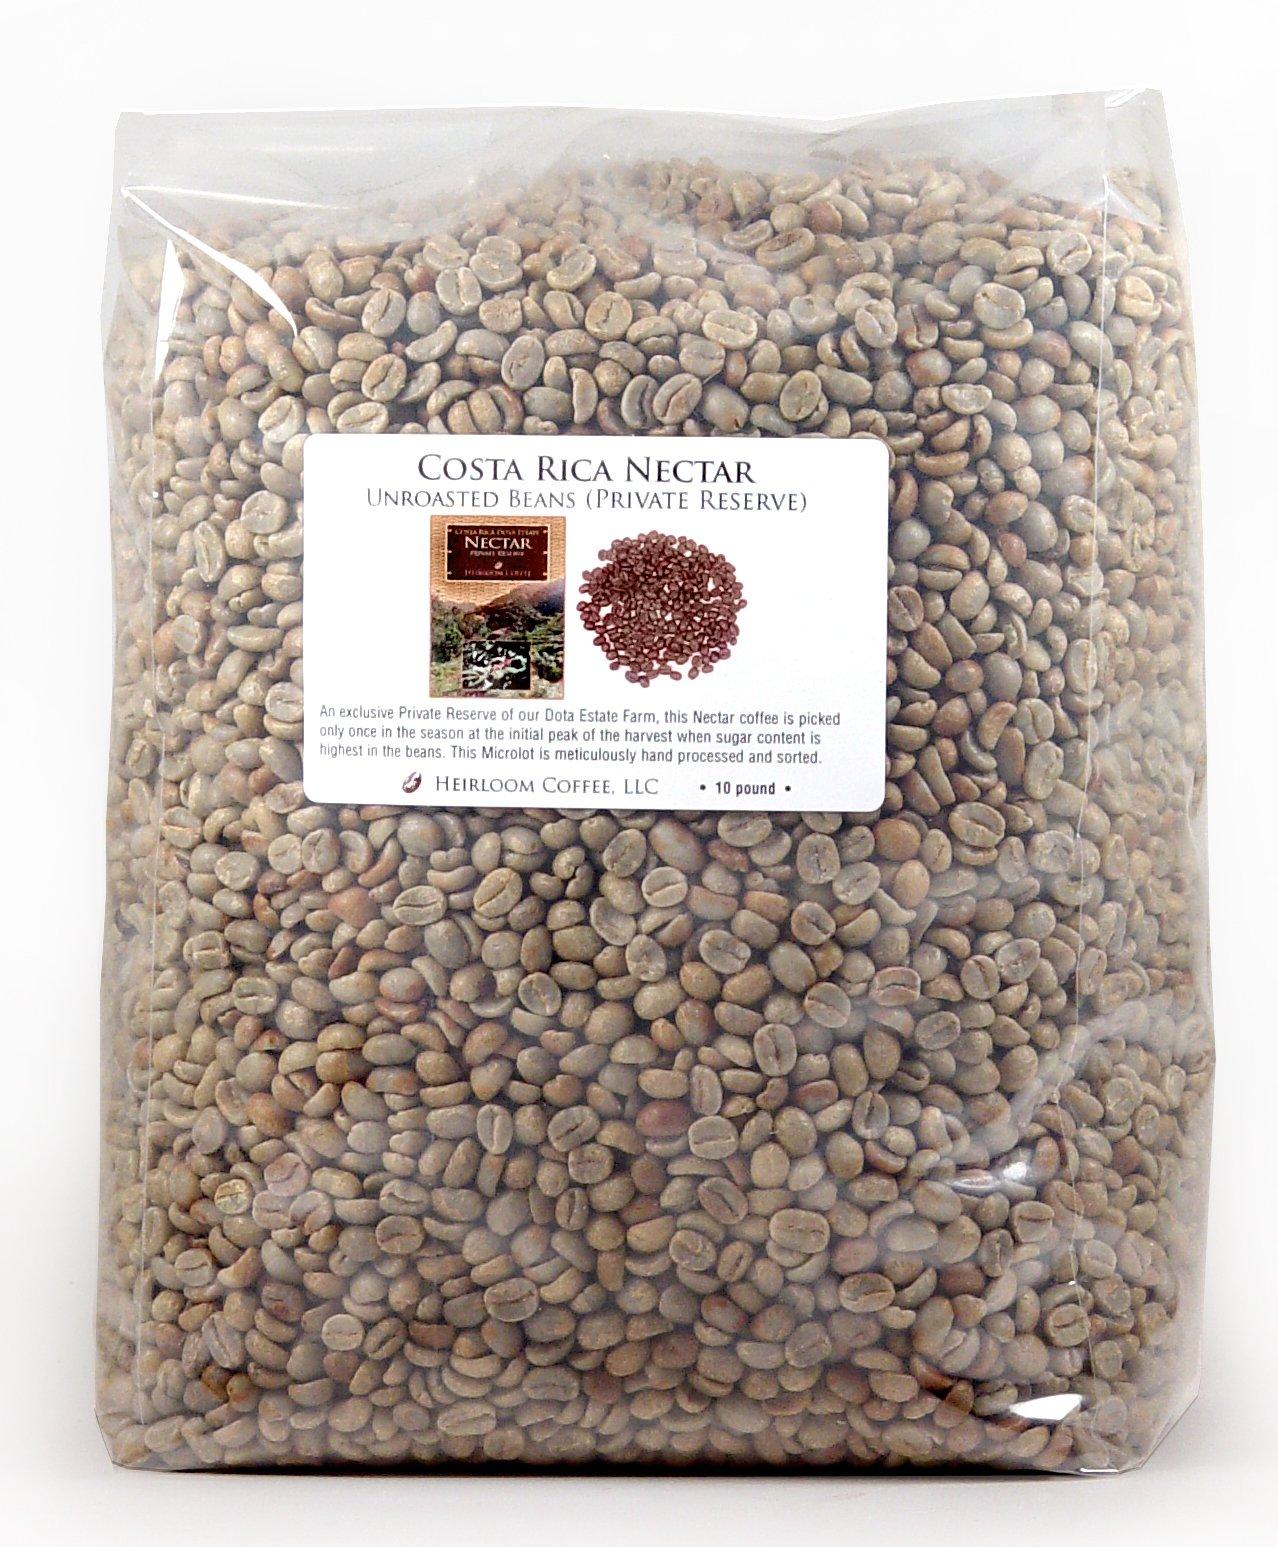 Costa Rica Dota Nectar, Green Unroasted Coffee Beans (10 LB Nectar) by Heirloom Coffee LLC